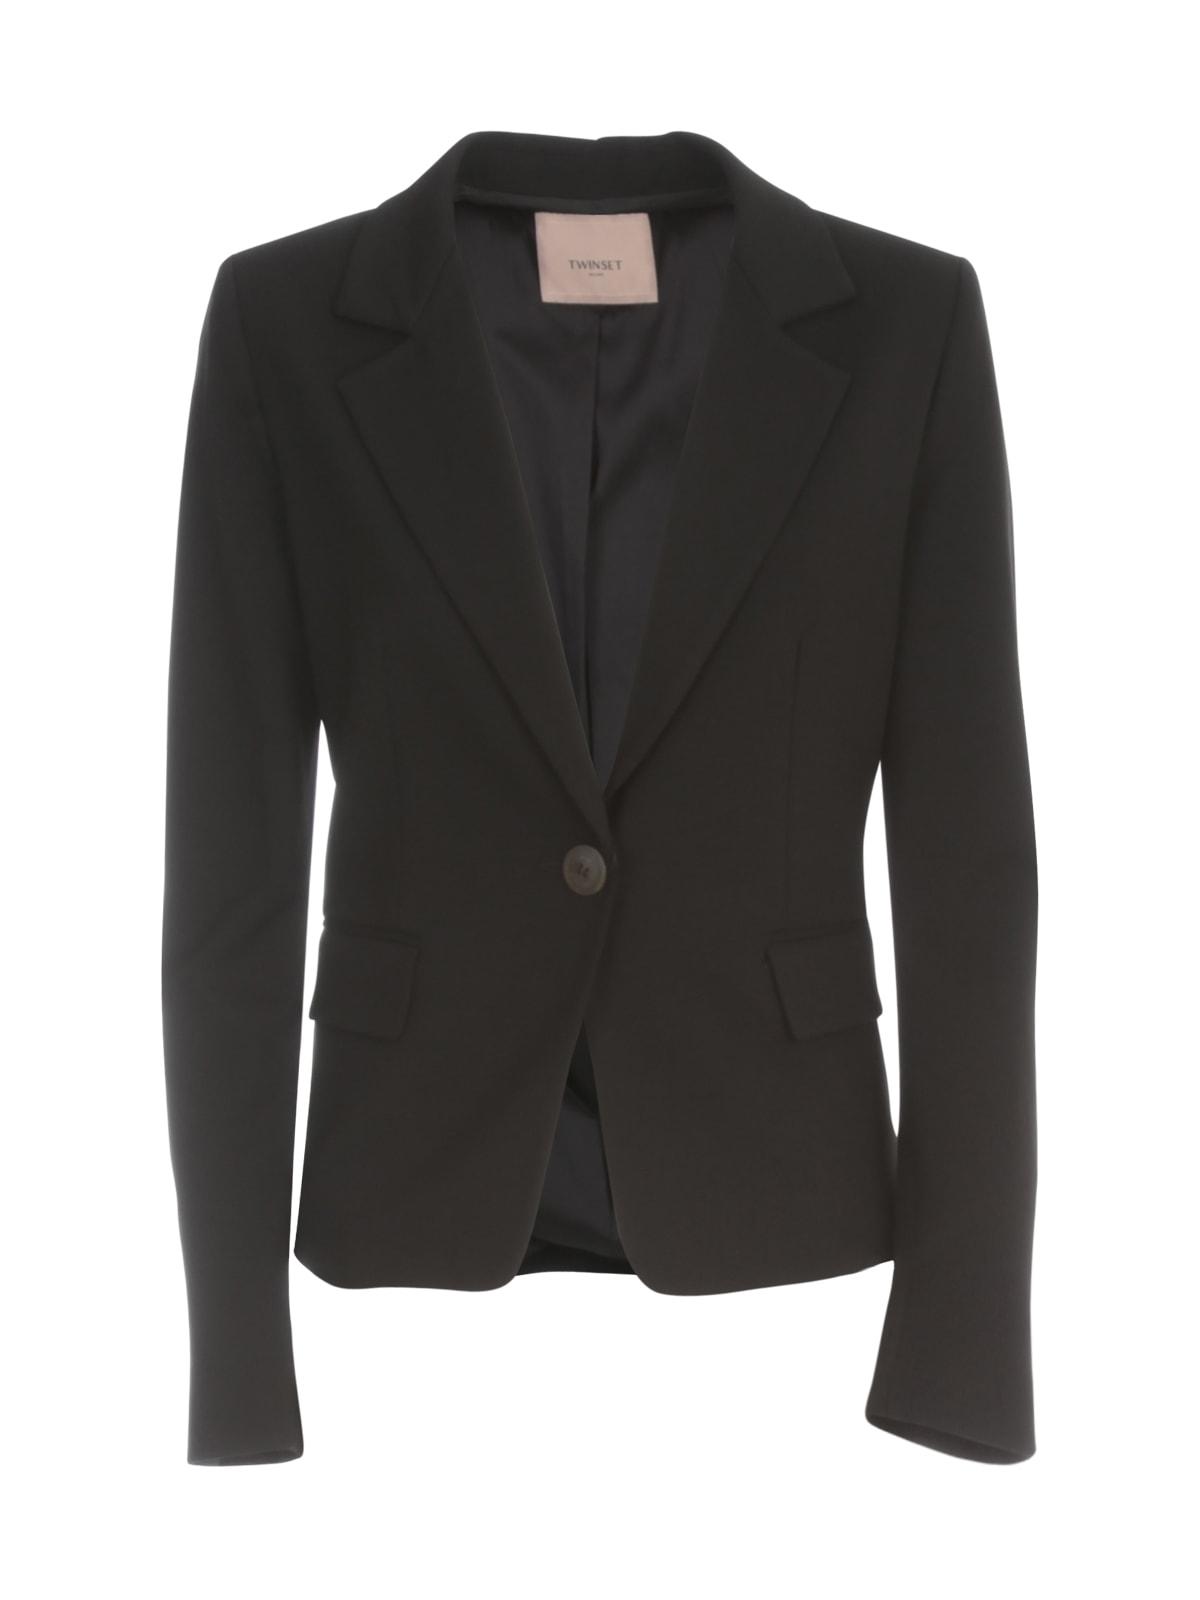 TwinSet Short Single Breasted Jacket